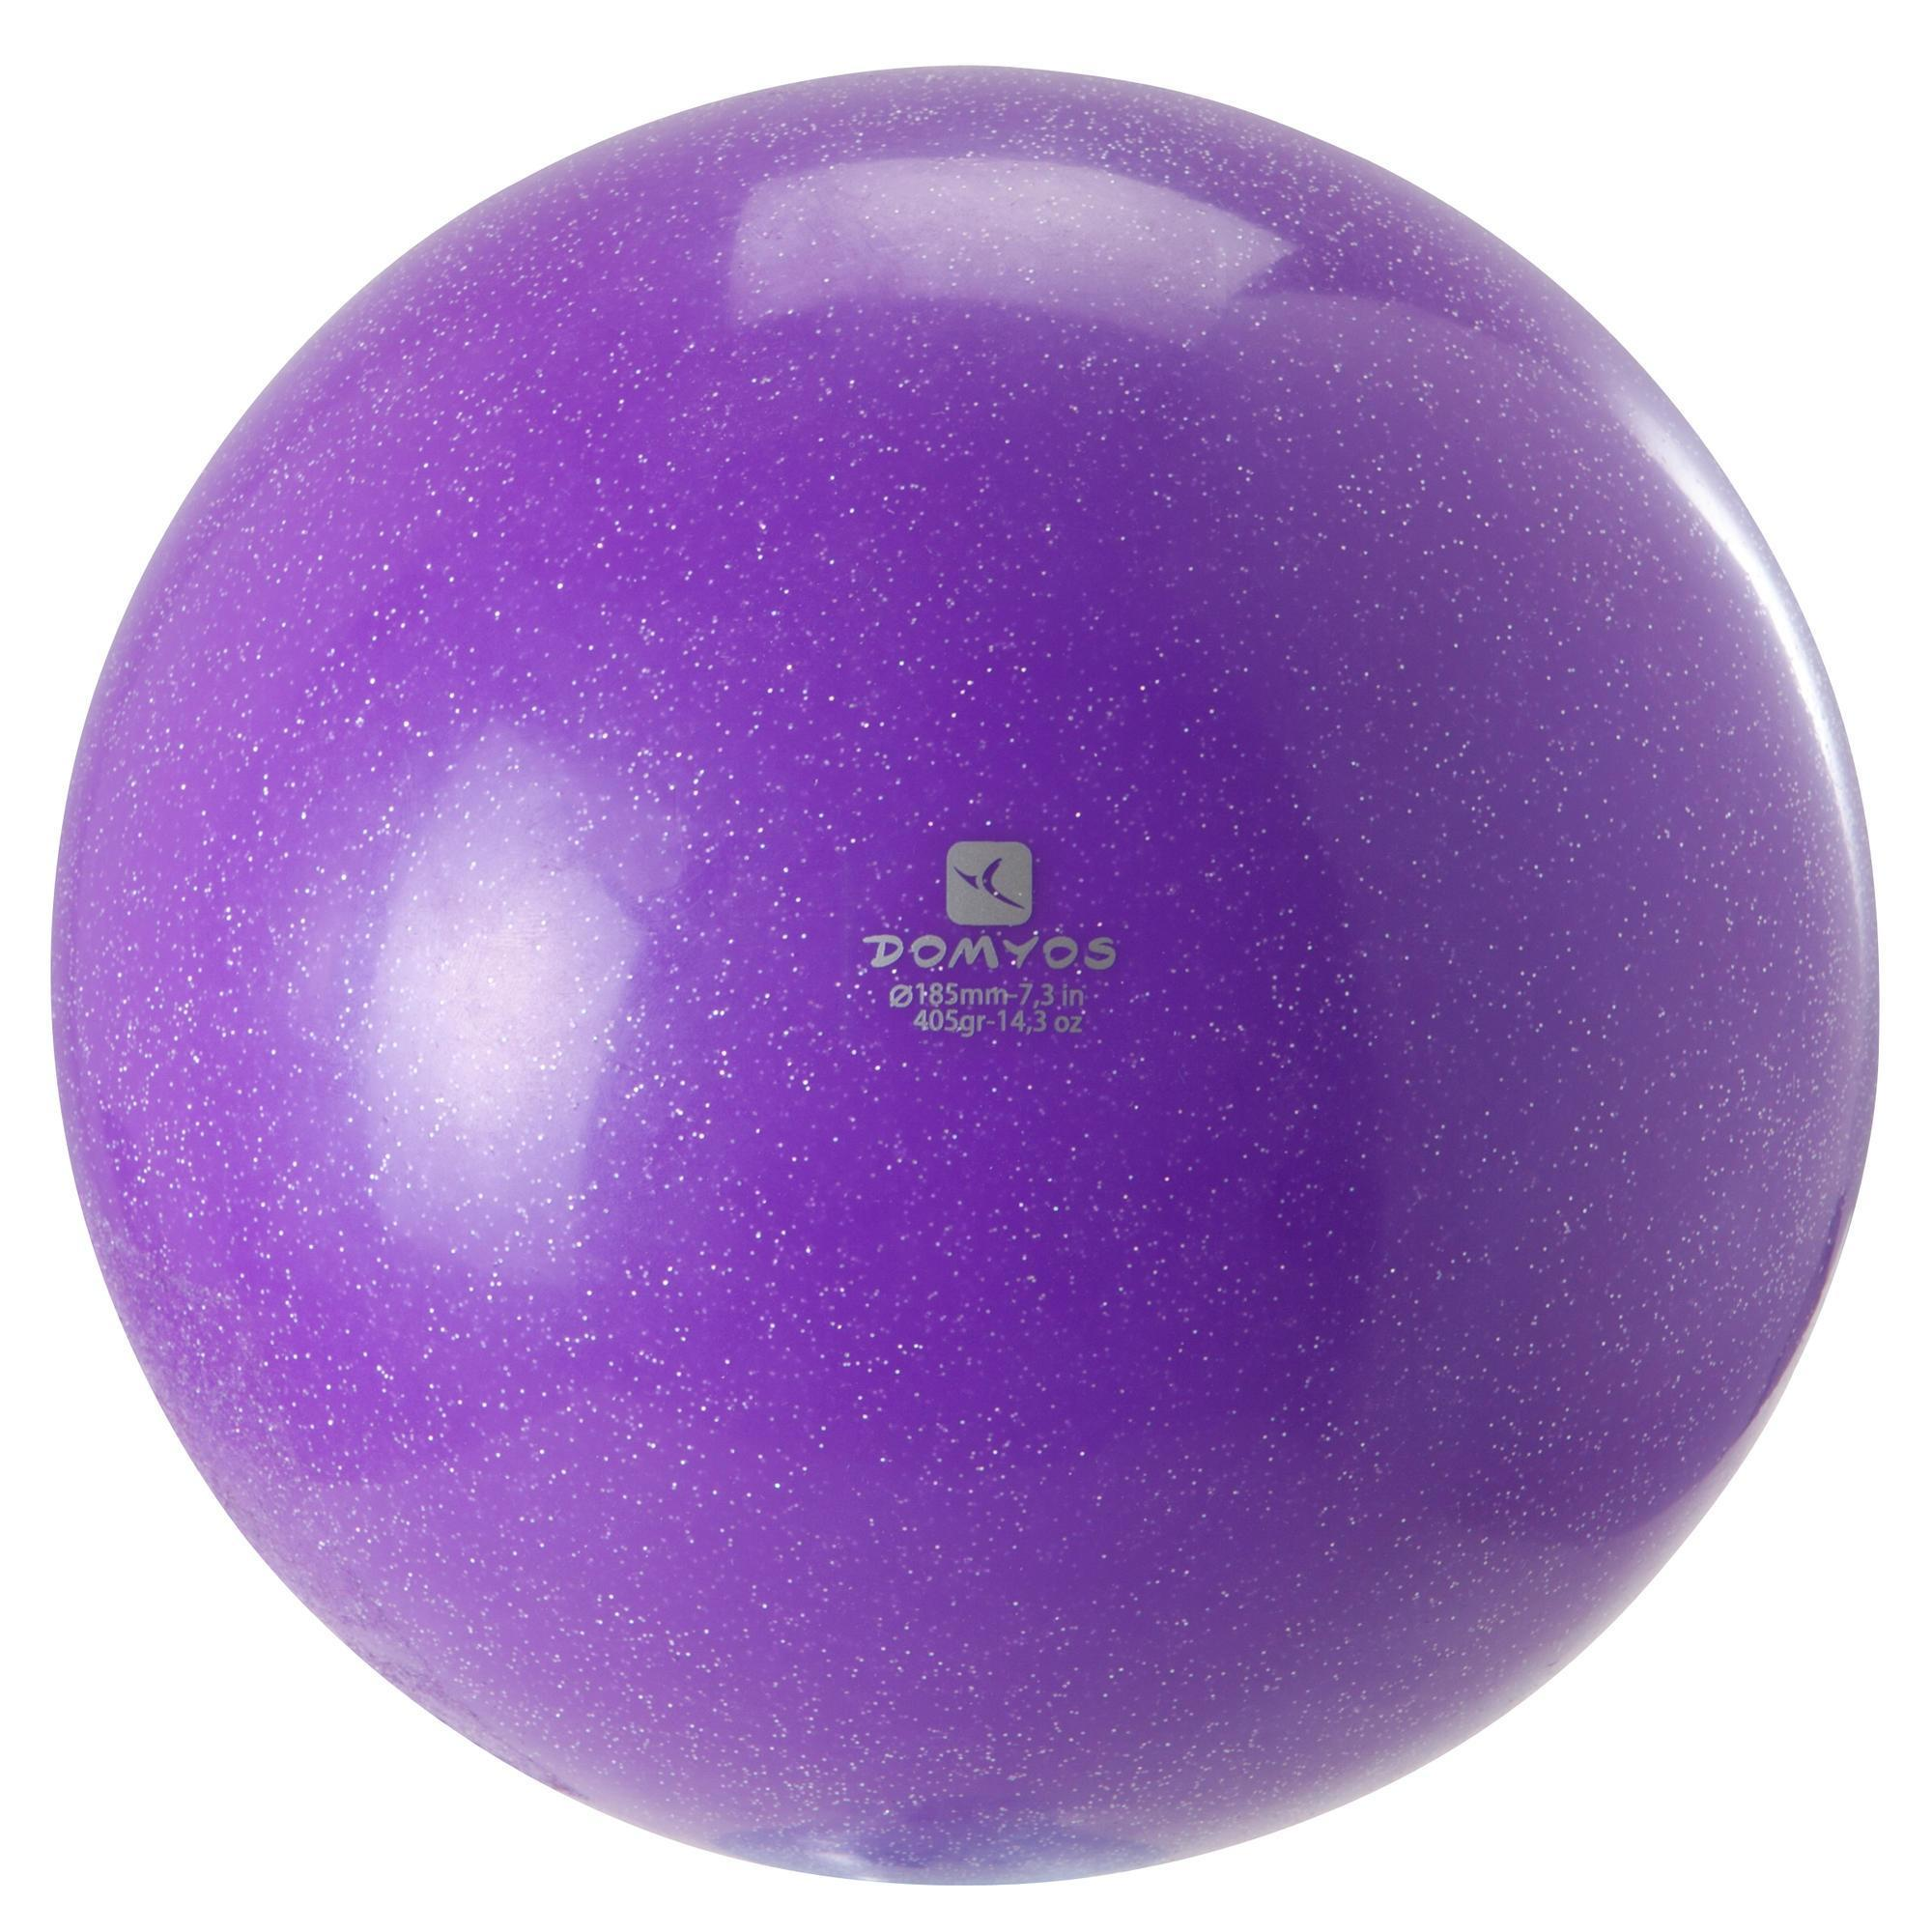 ballon de gymnastique rythmique gr 185 mm paillettes violet domyos by decathlon. Black Bedroom Furniture Sets. Home Design Ideas